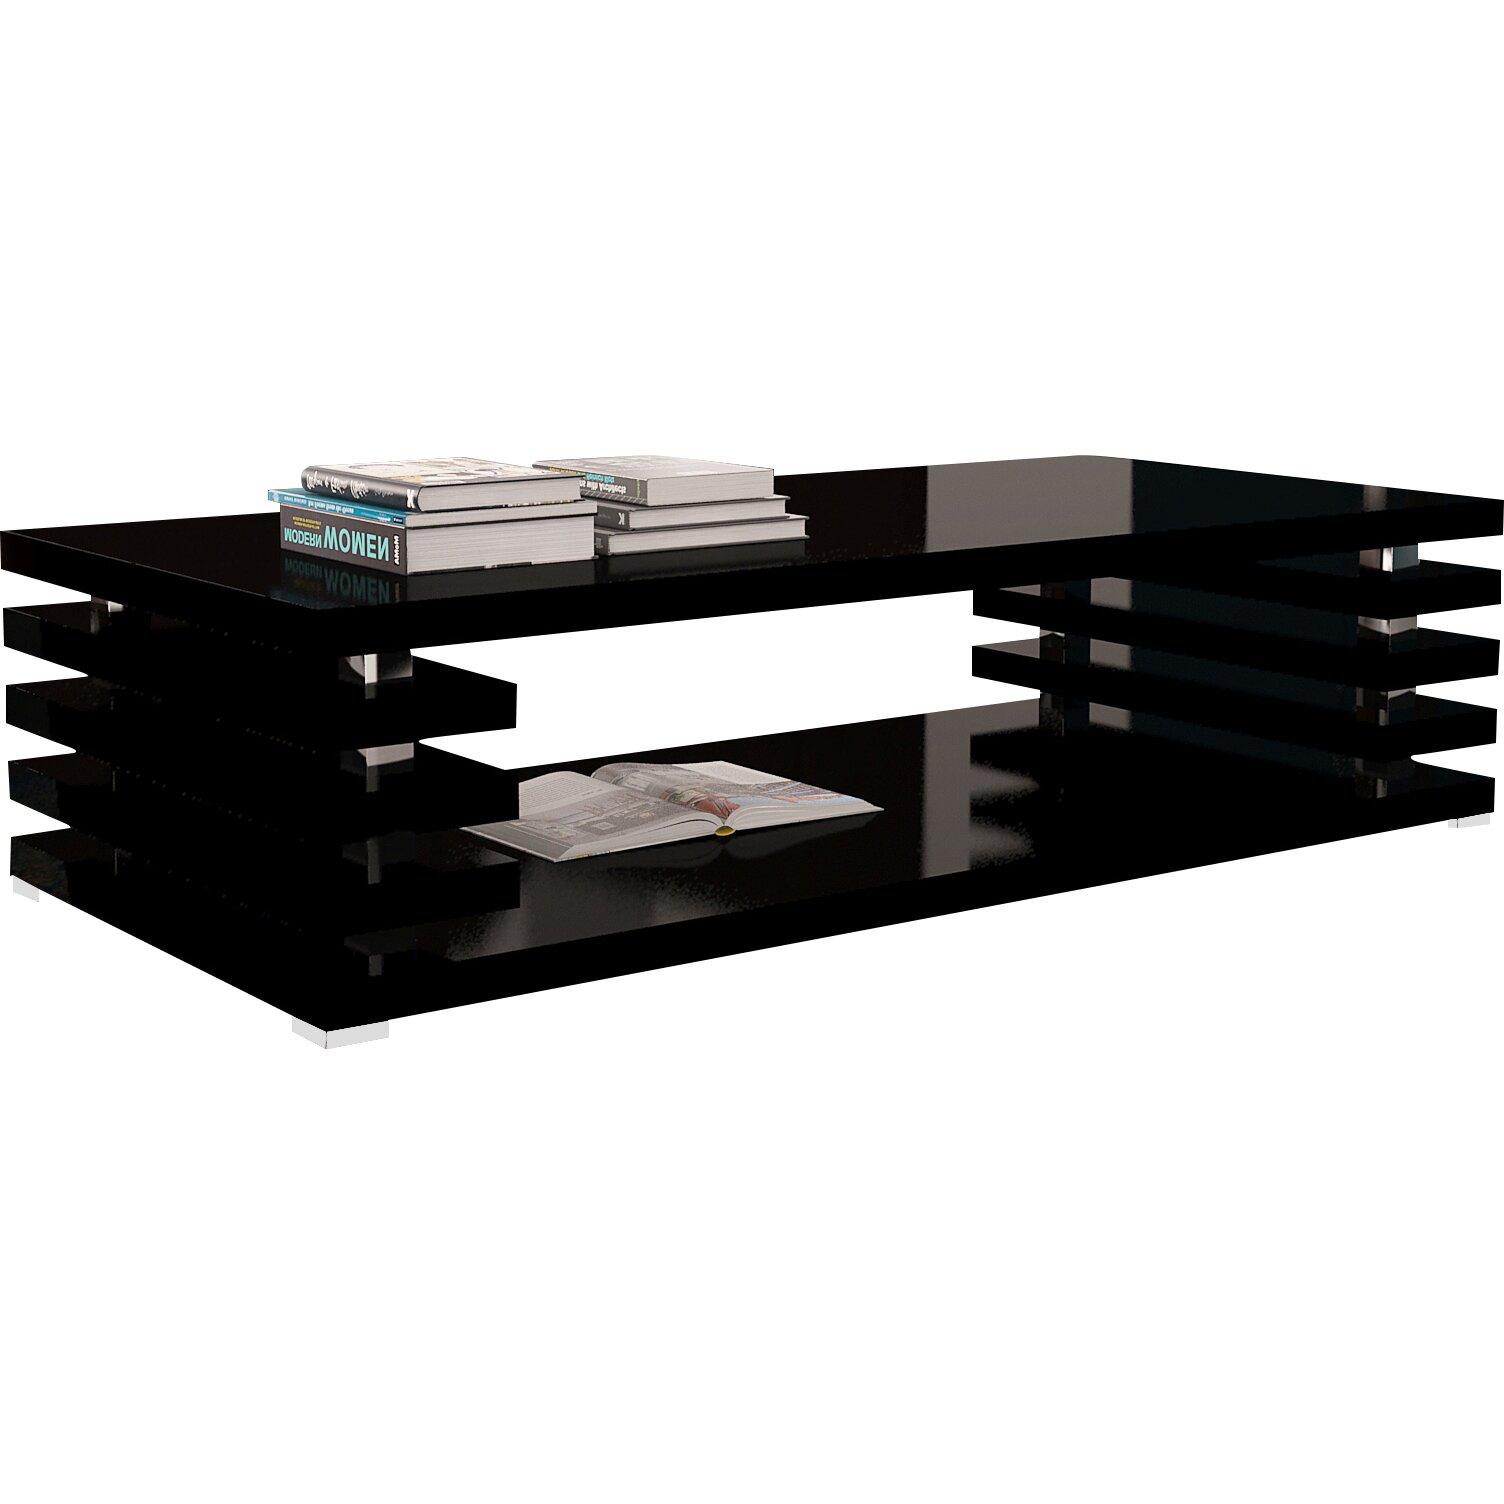 Wayfair Glass Coffee Table Uk: DCor Design Pikal Coffee Table & Reviews